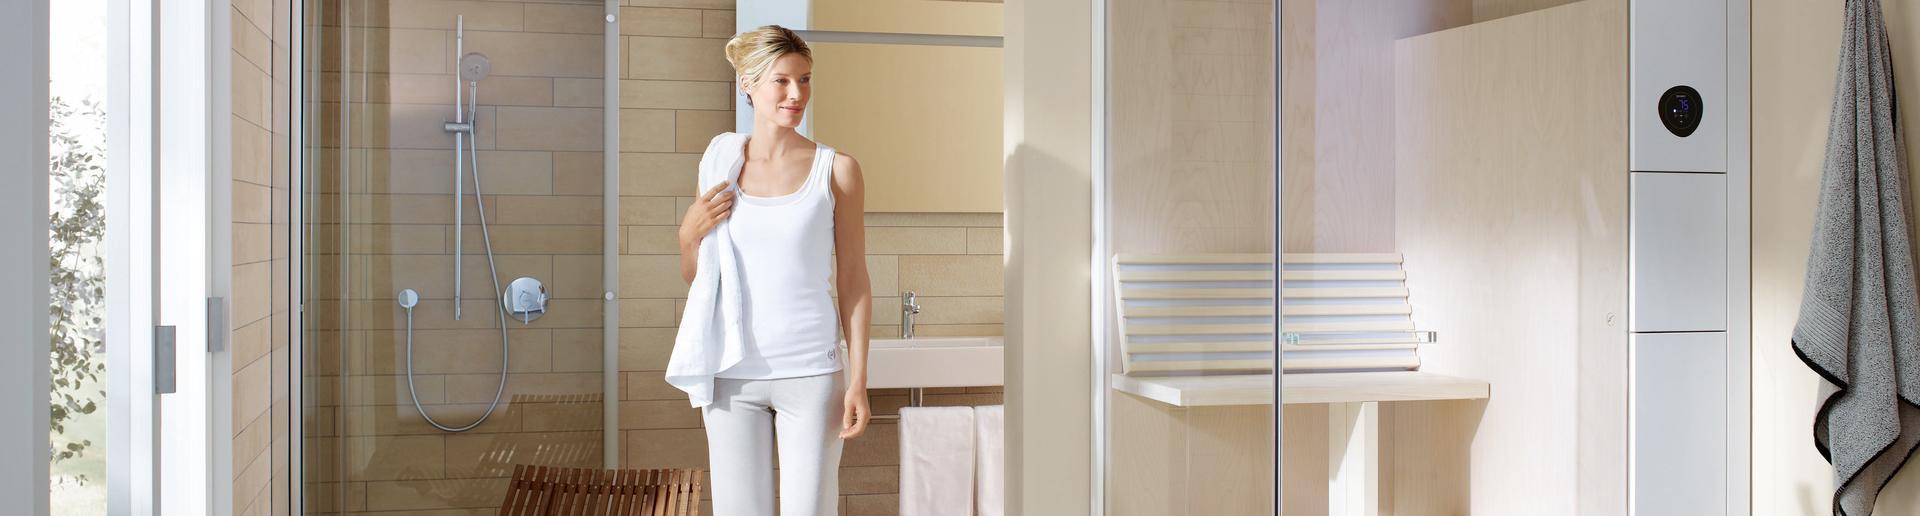 Wellness Sauna Bad Heizung